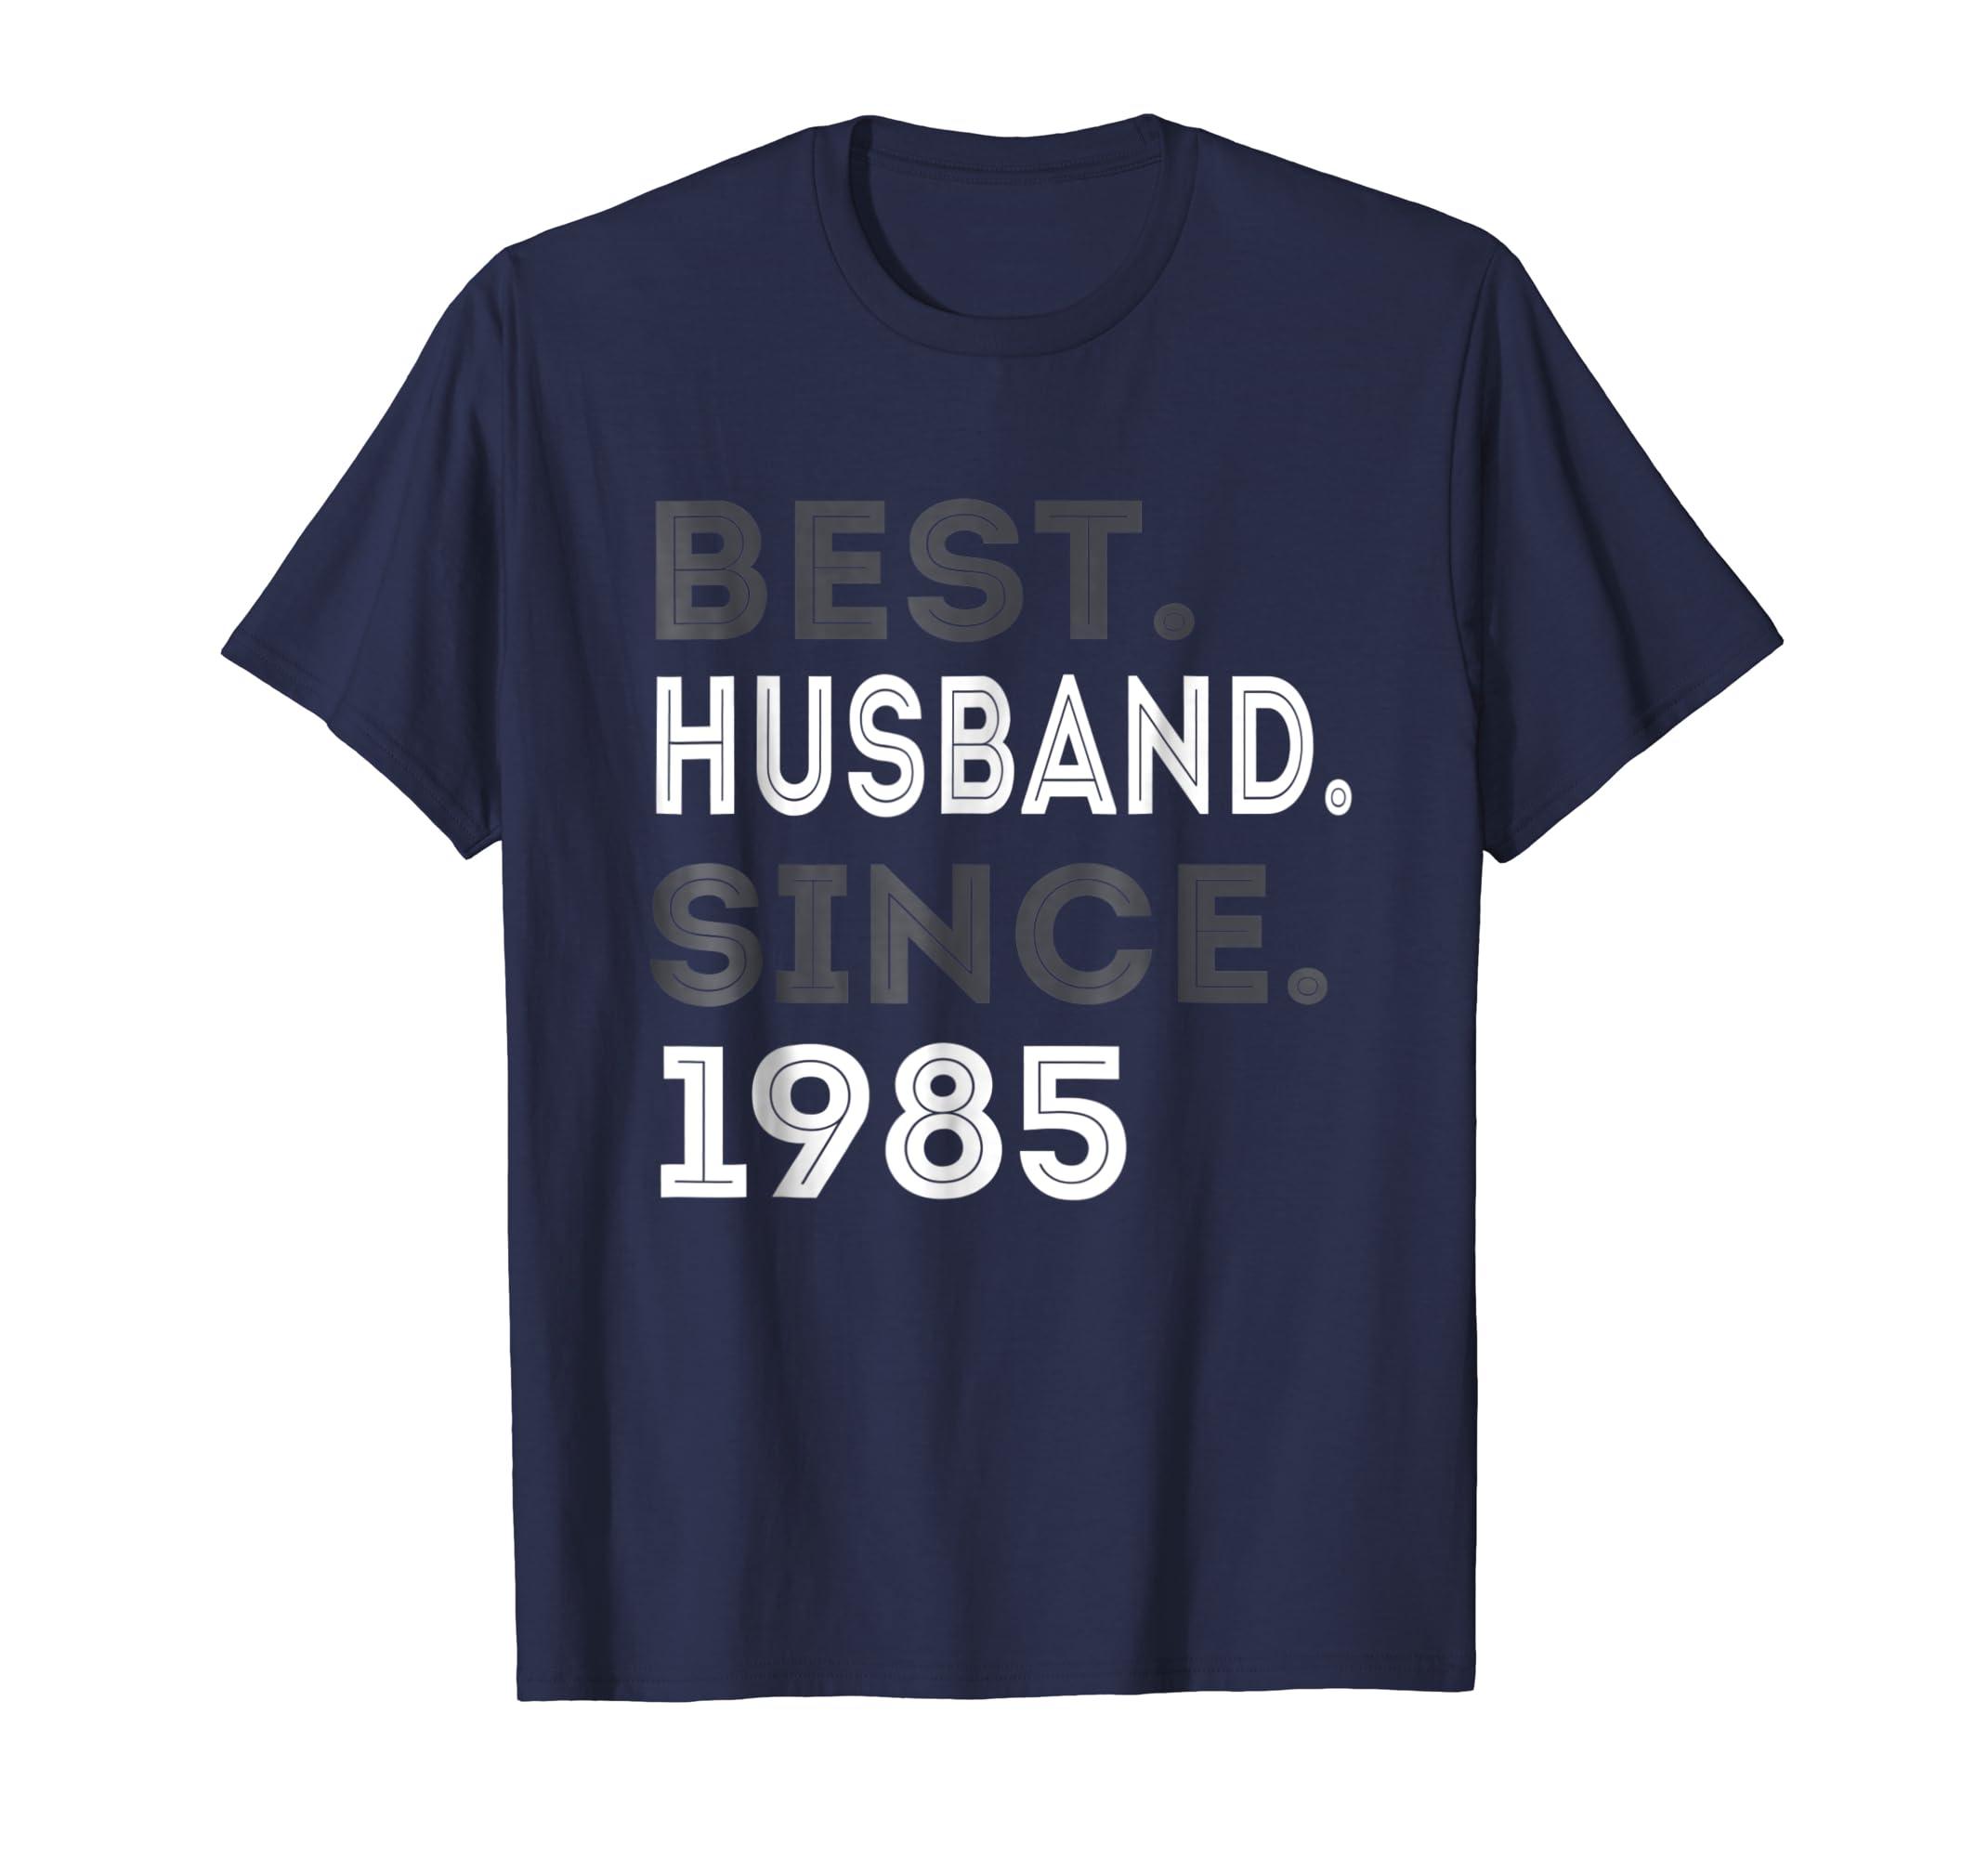 Best Husband Since 1985 34th Wedding Anniversary Gift-azvn